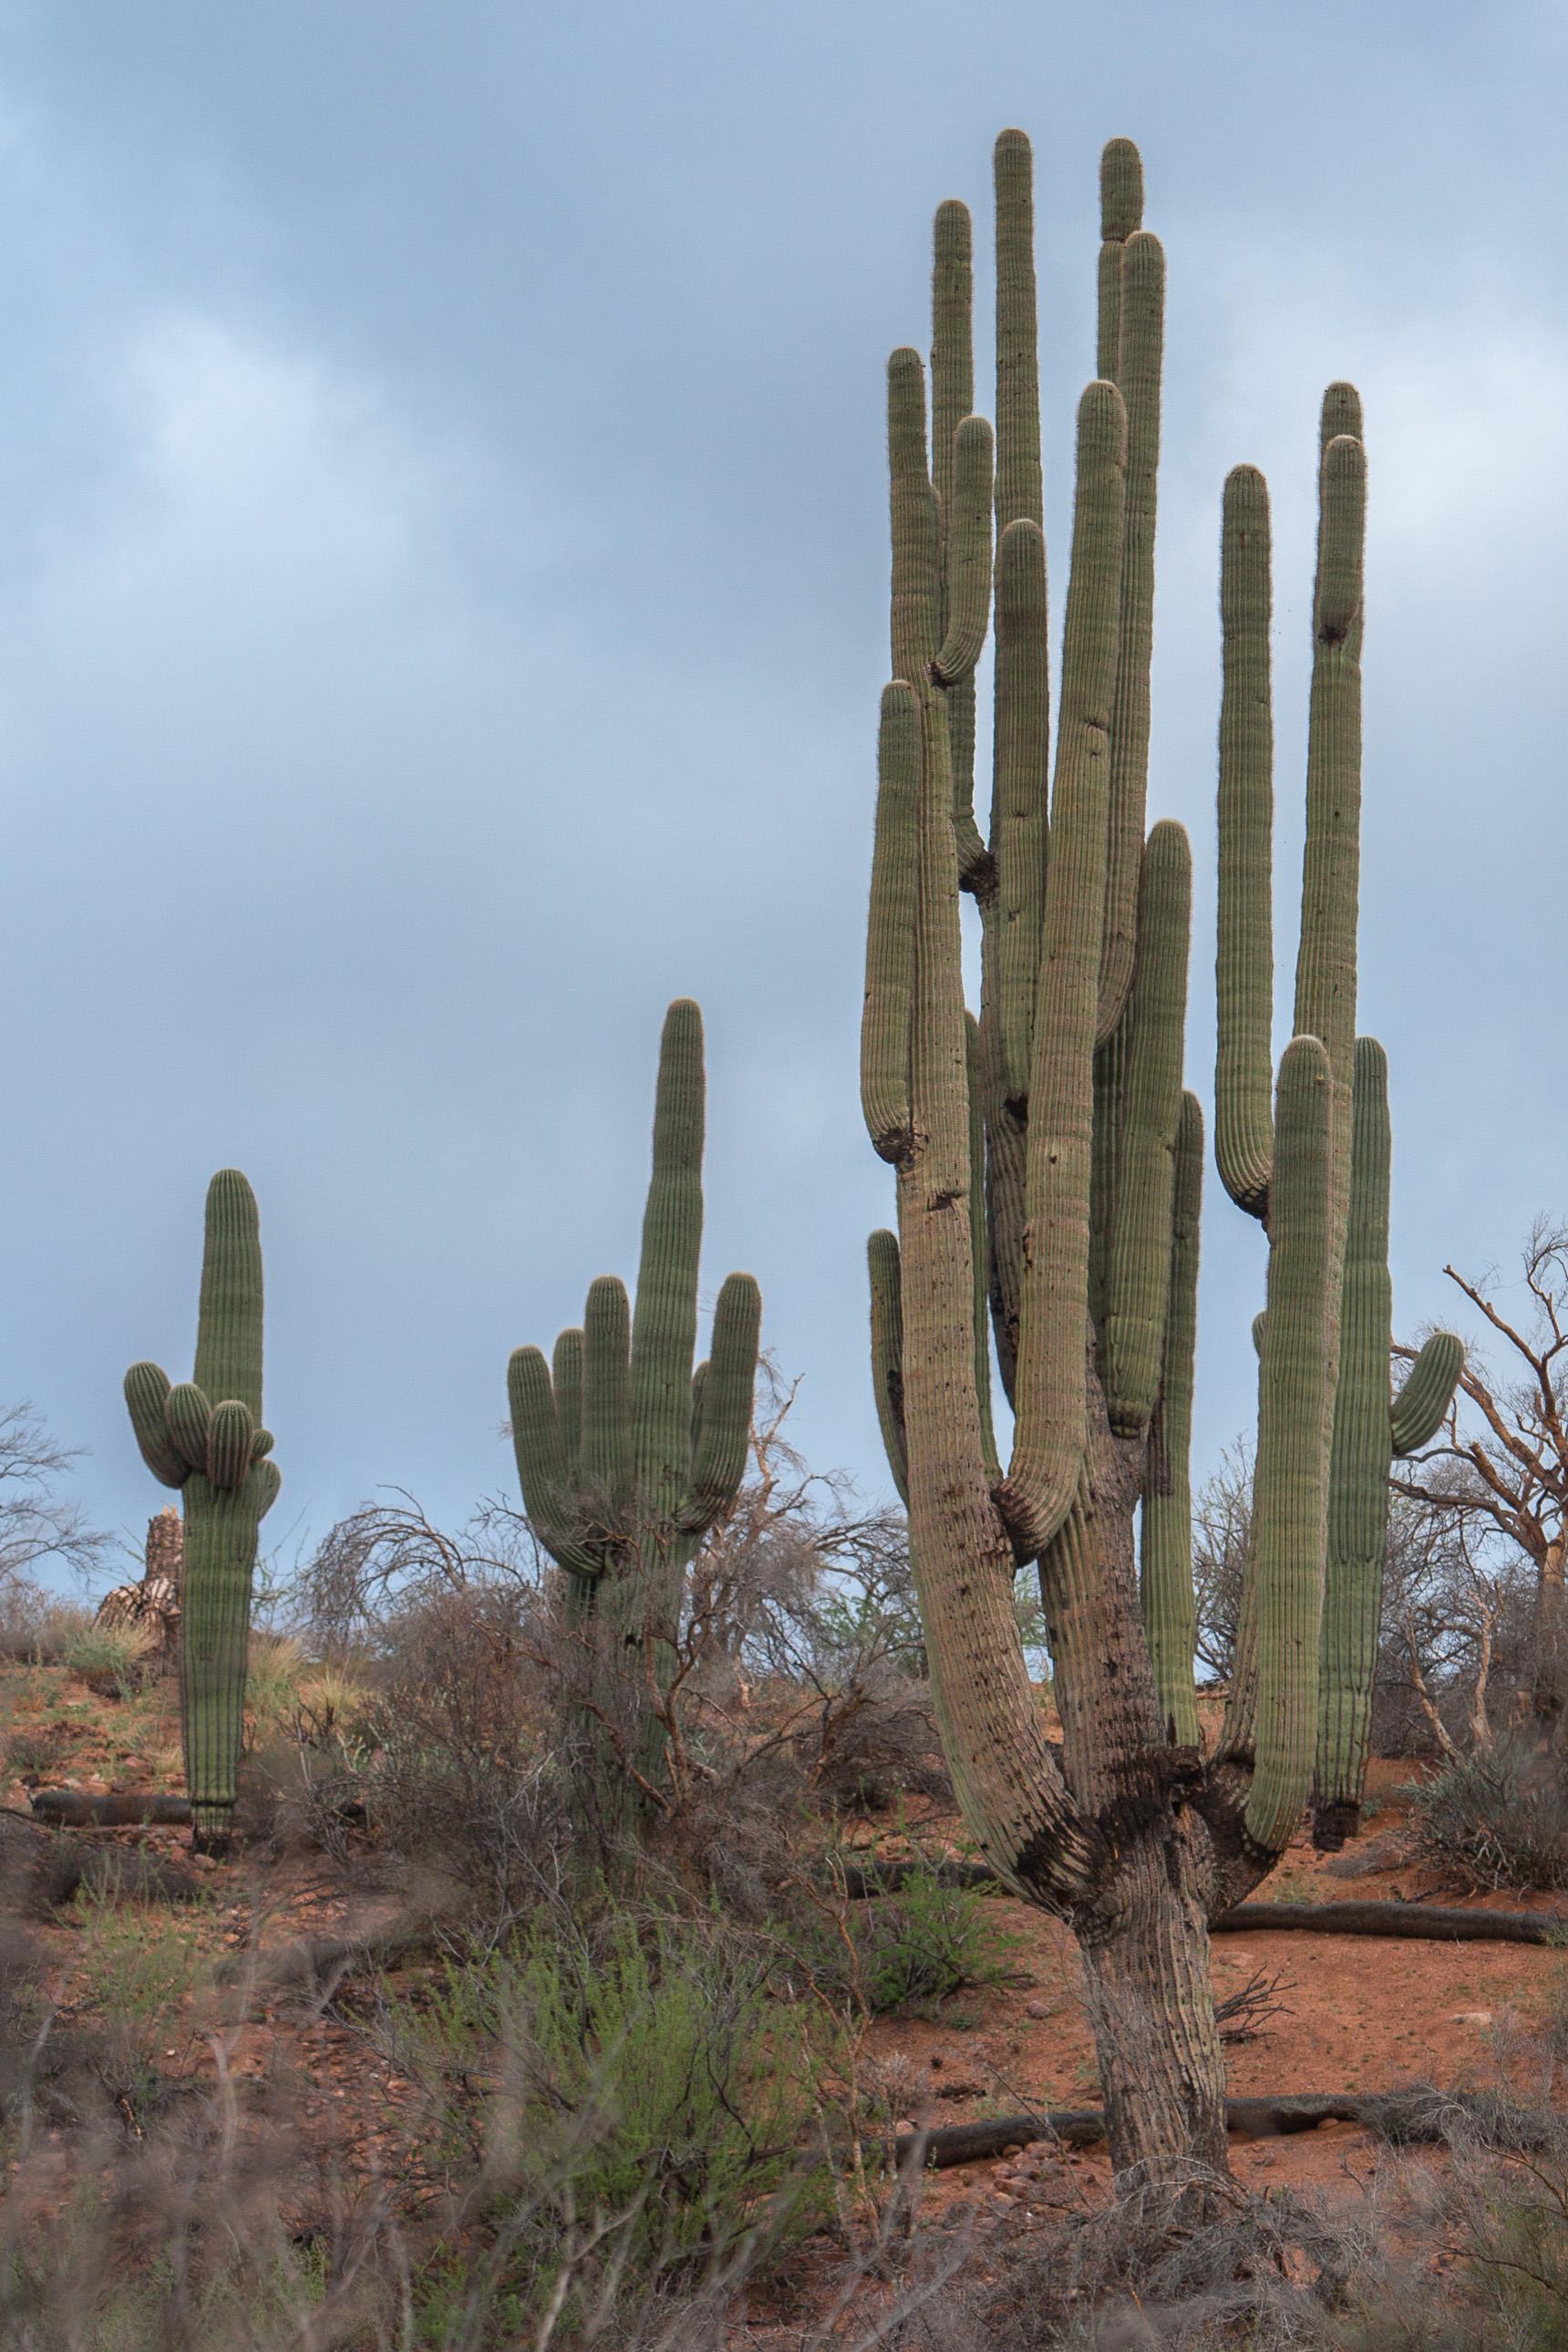 The Grand One saguaro cactus